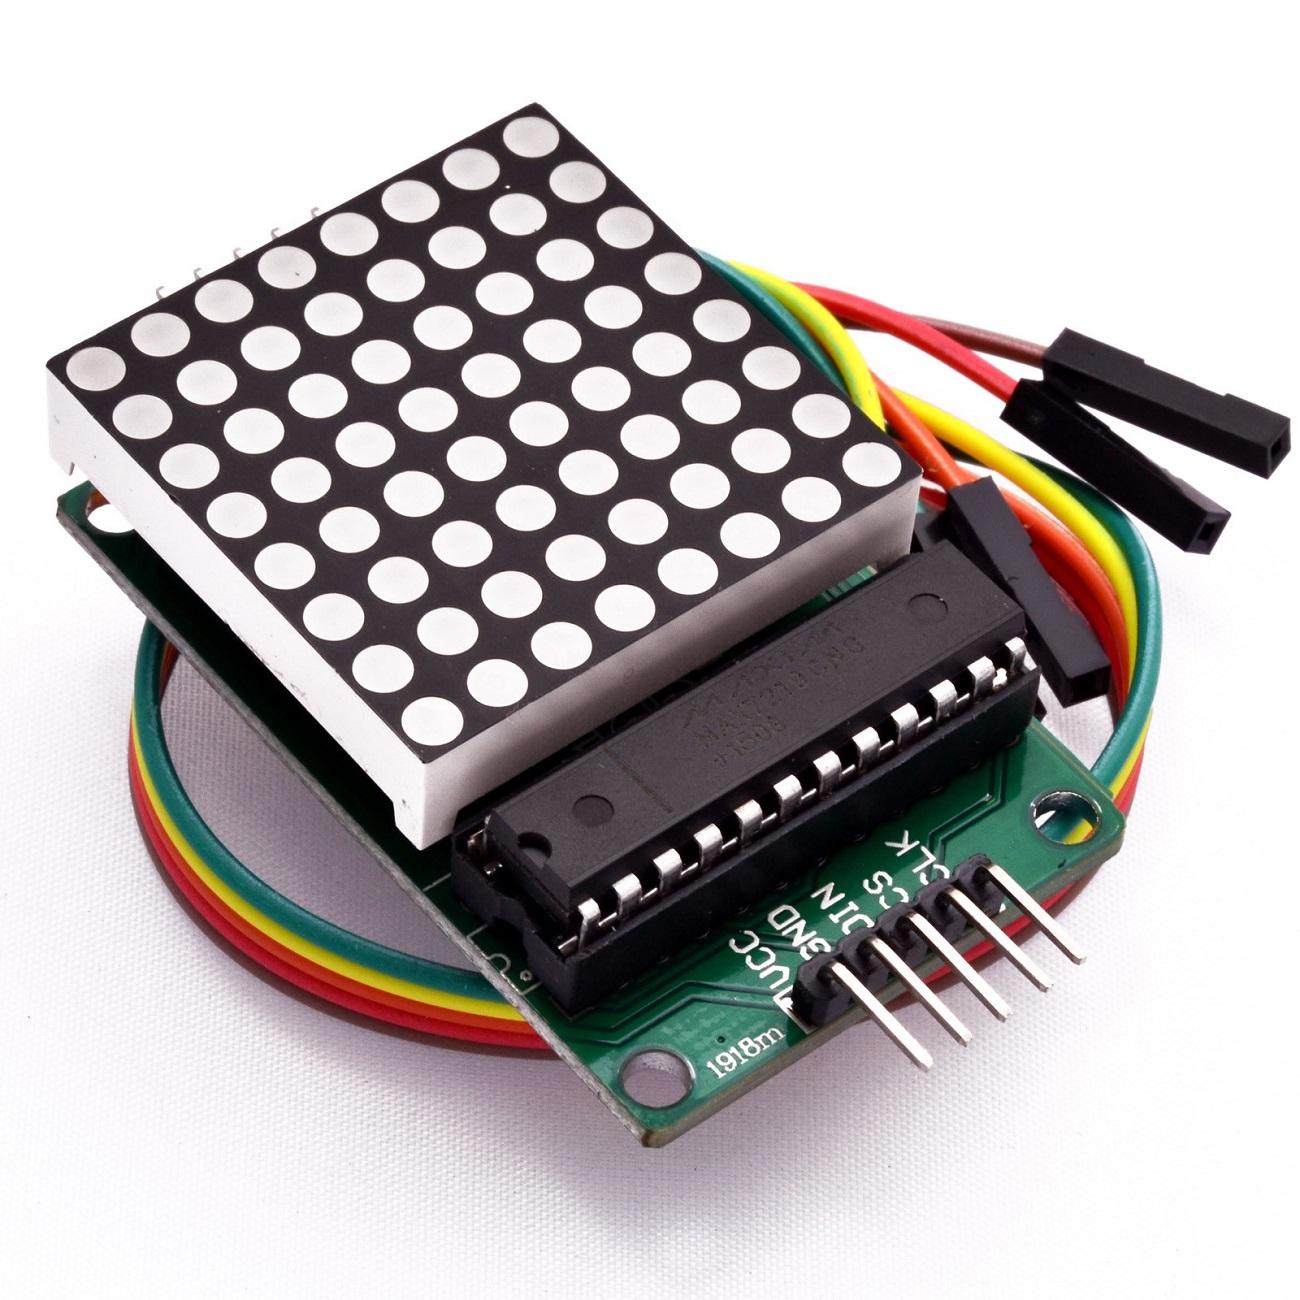 led matrix module, 8x8 led matrix, max7219 module, matrix display module, display matrix